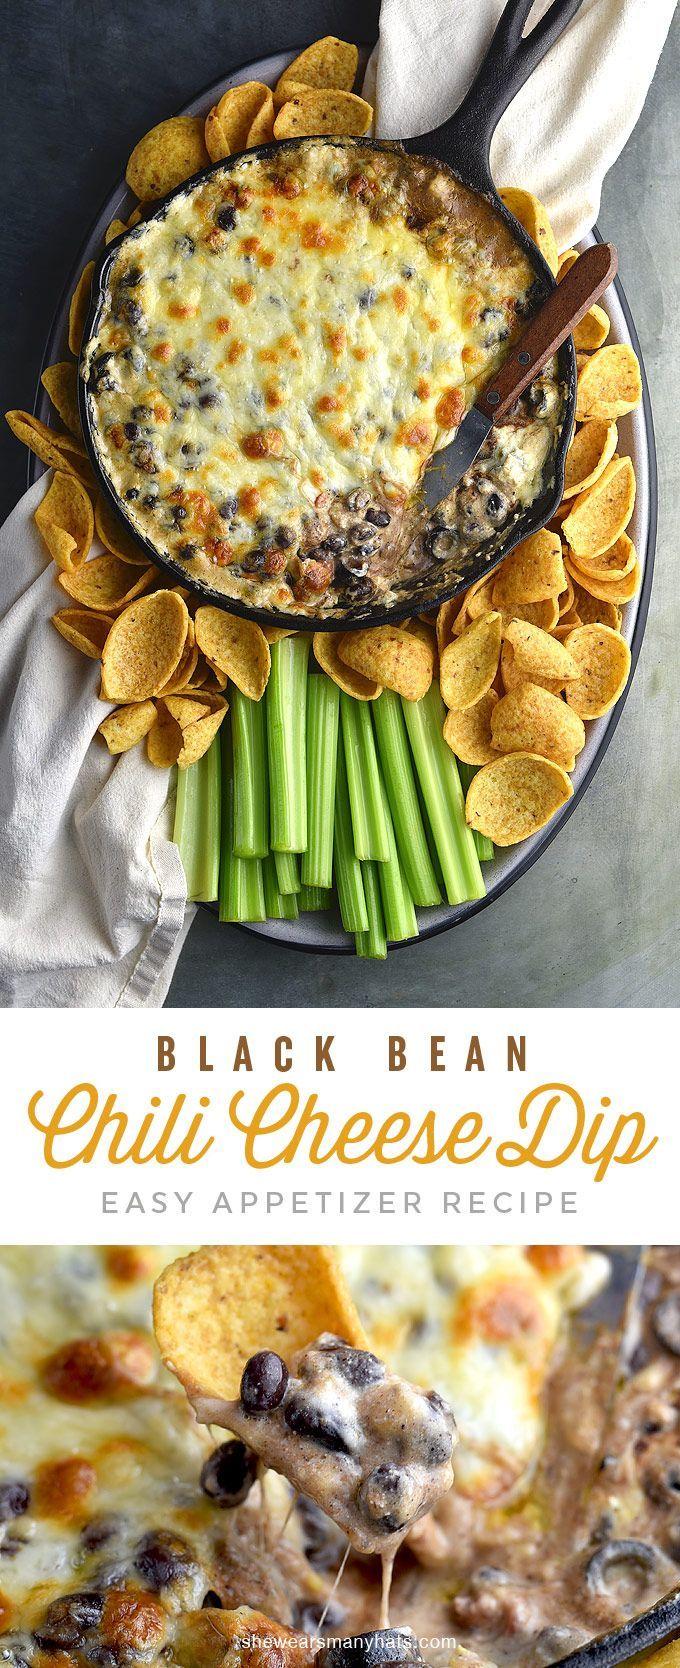 Easy Hot Chili Cheese Dip Recipe | http://shewearsmanyhats.com